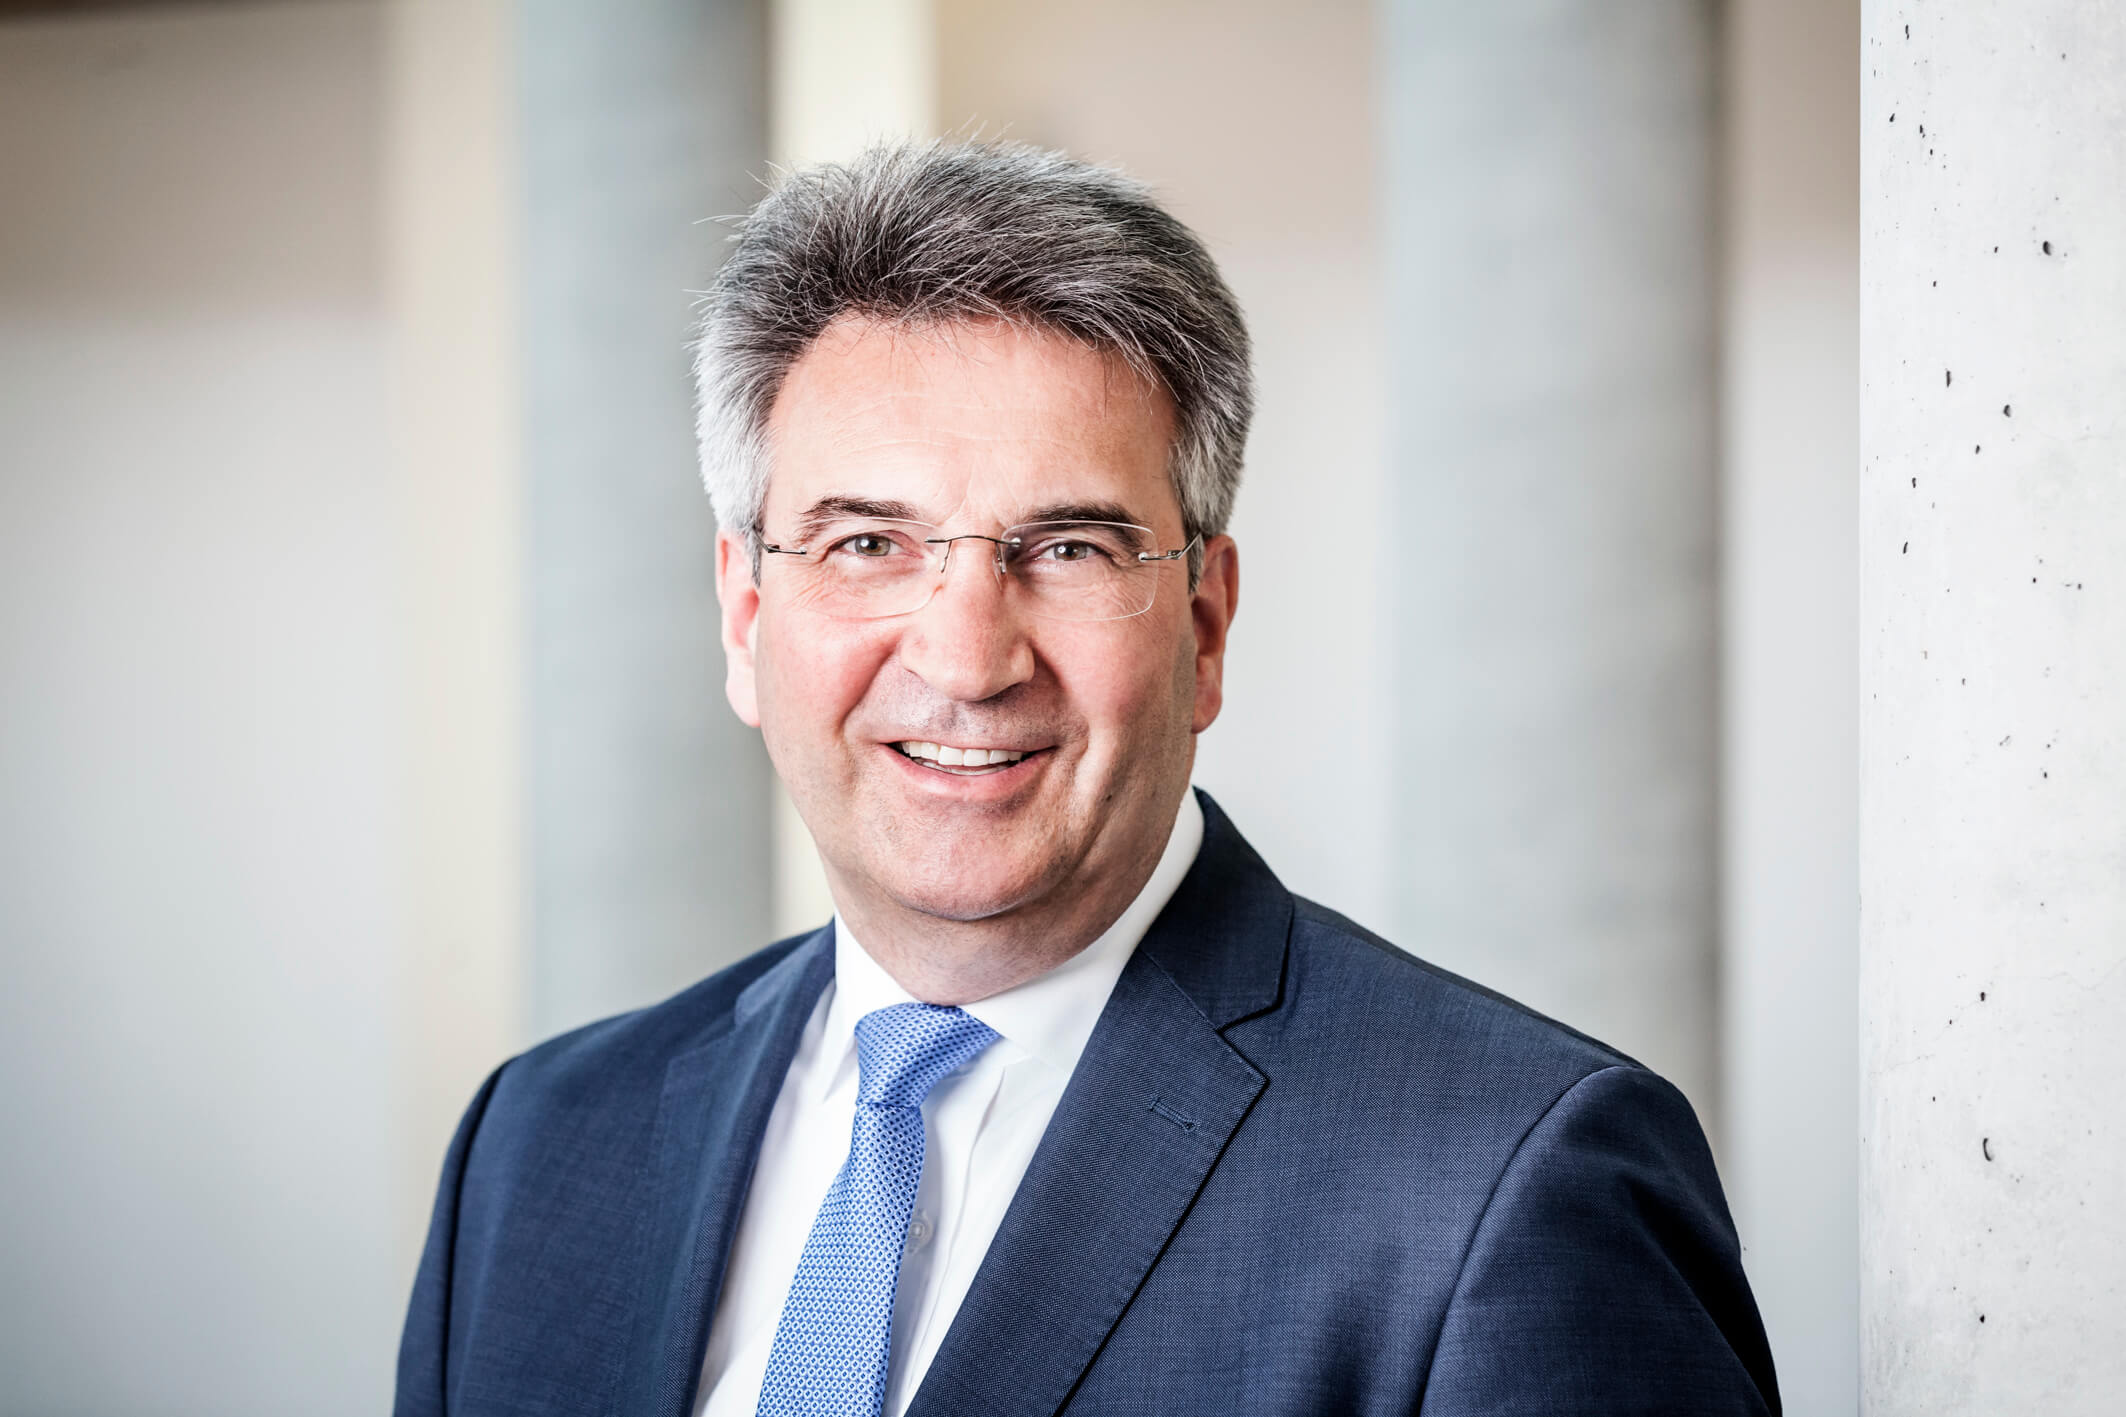 Bernd Wiechel